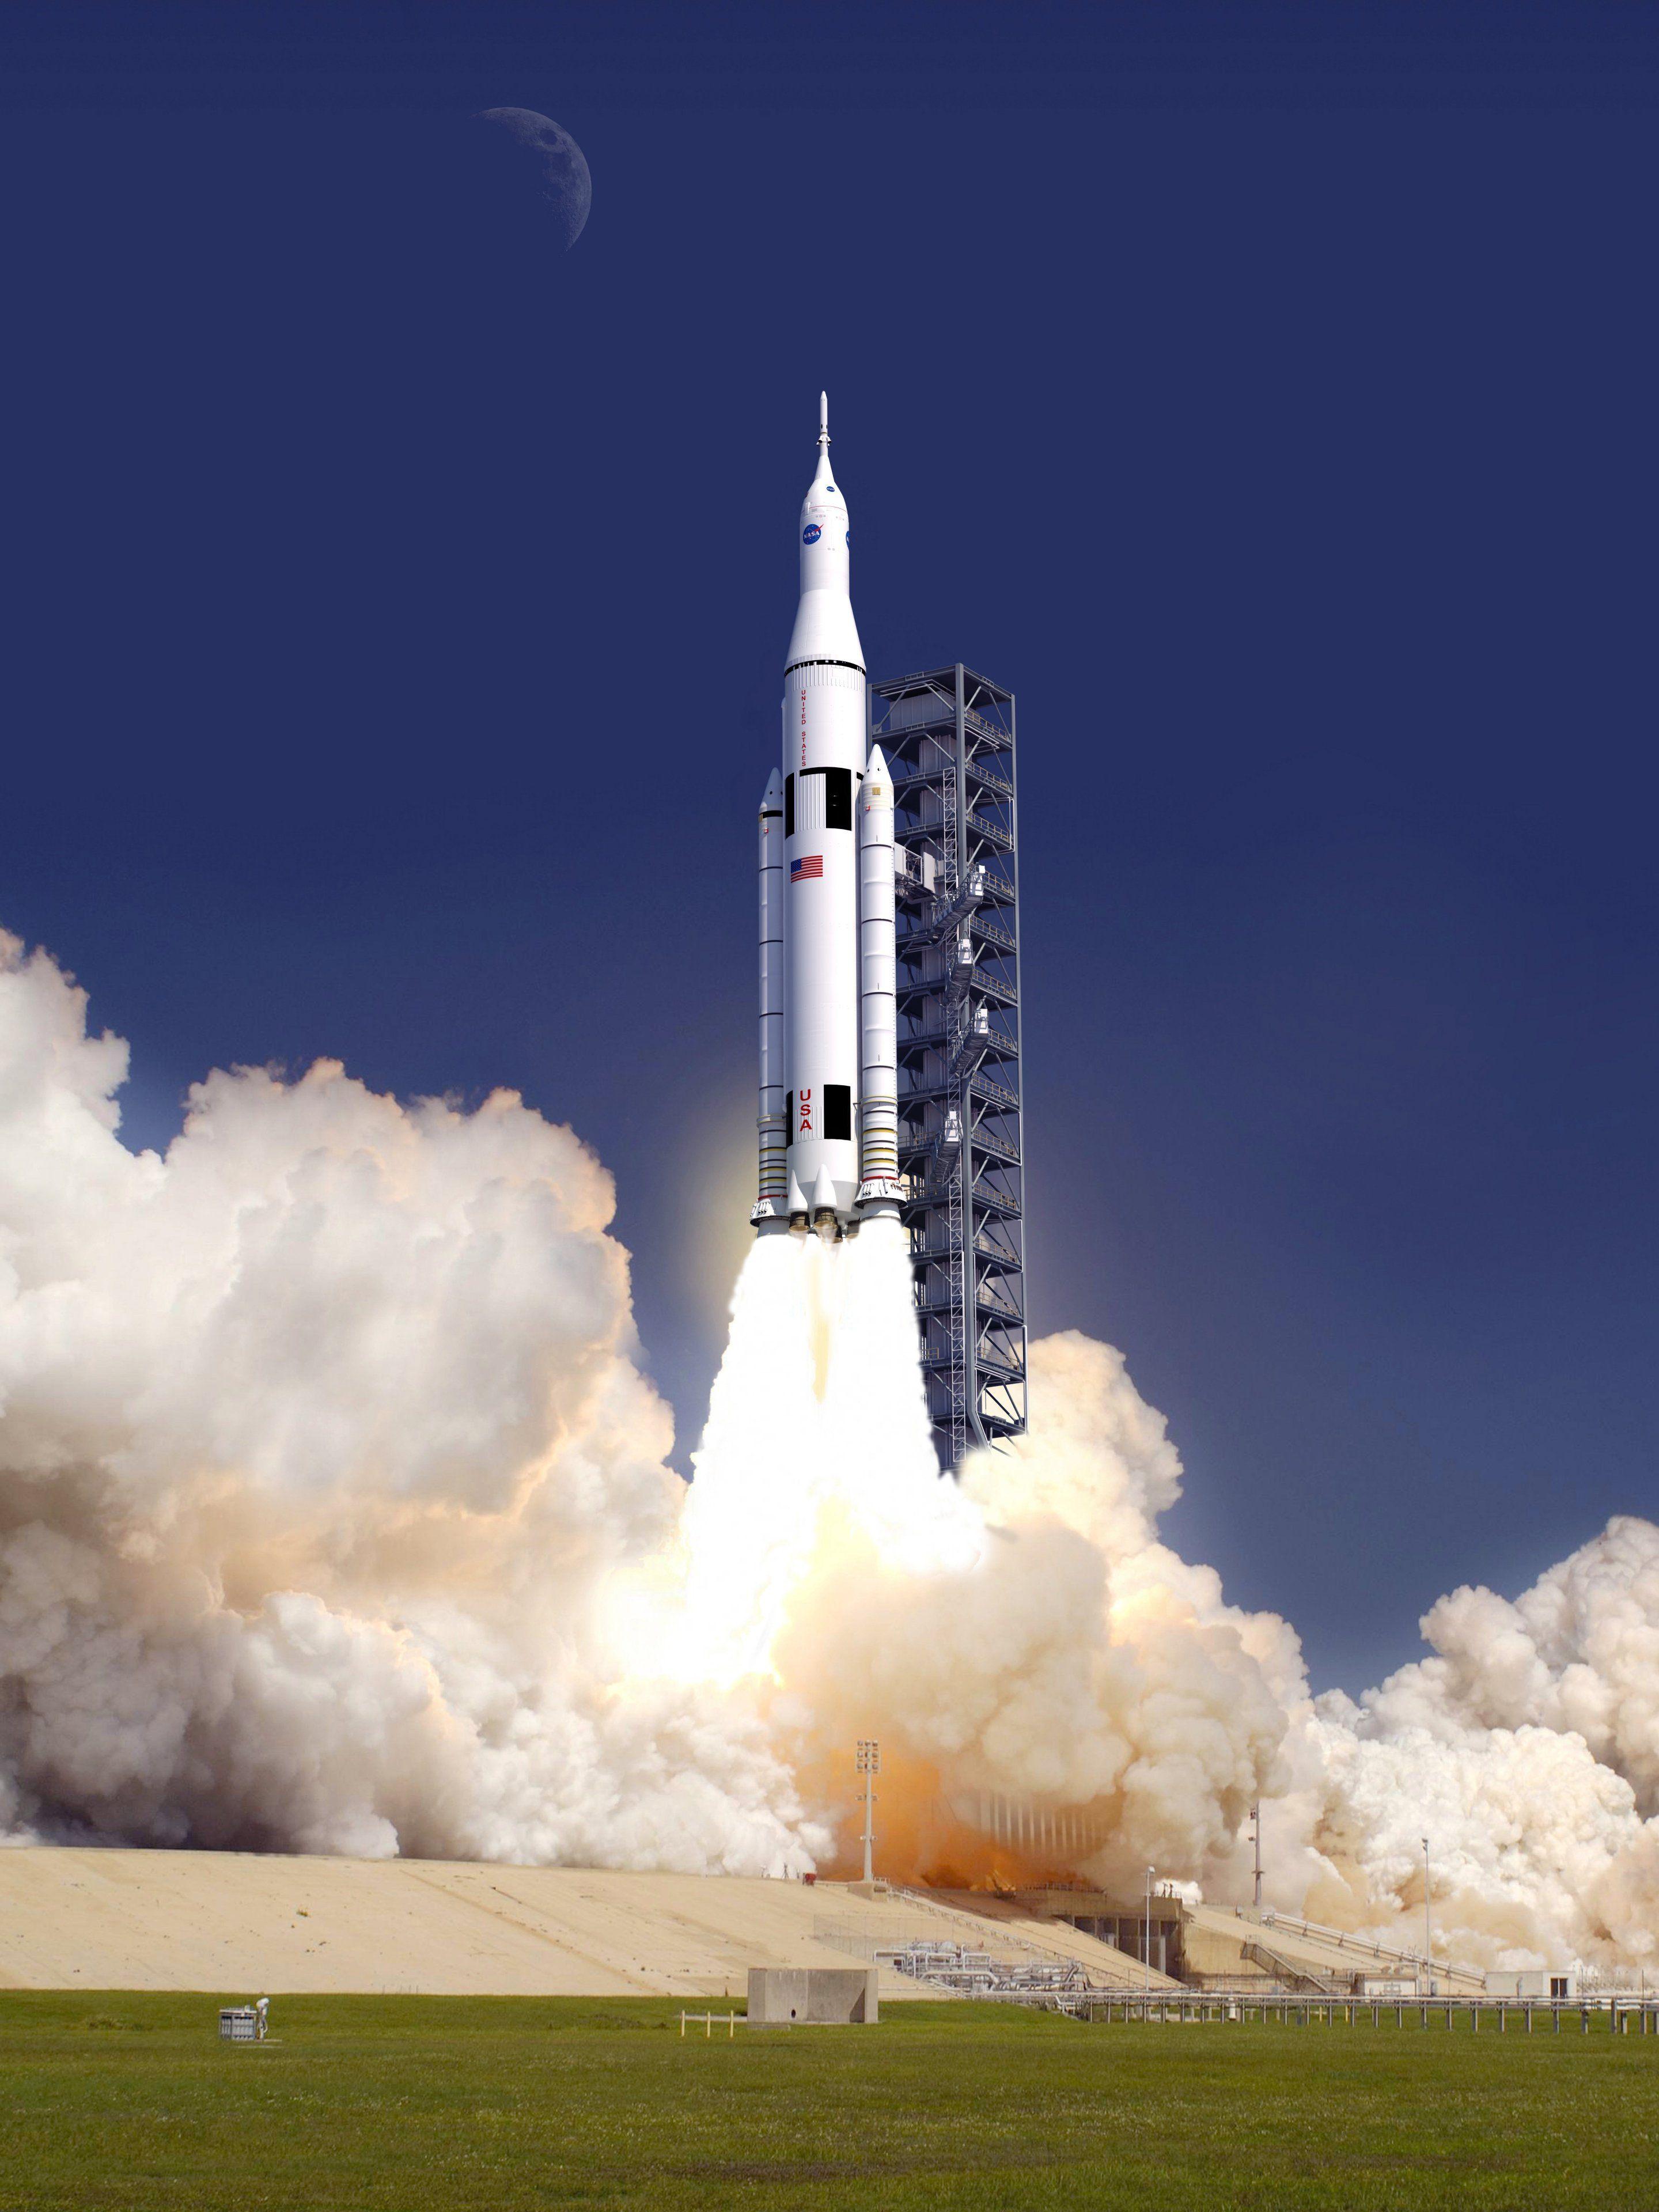 future rocket taking off - 750×1000